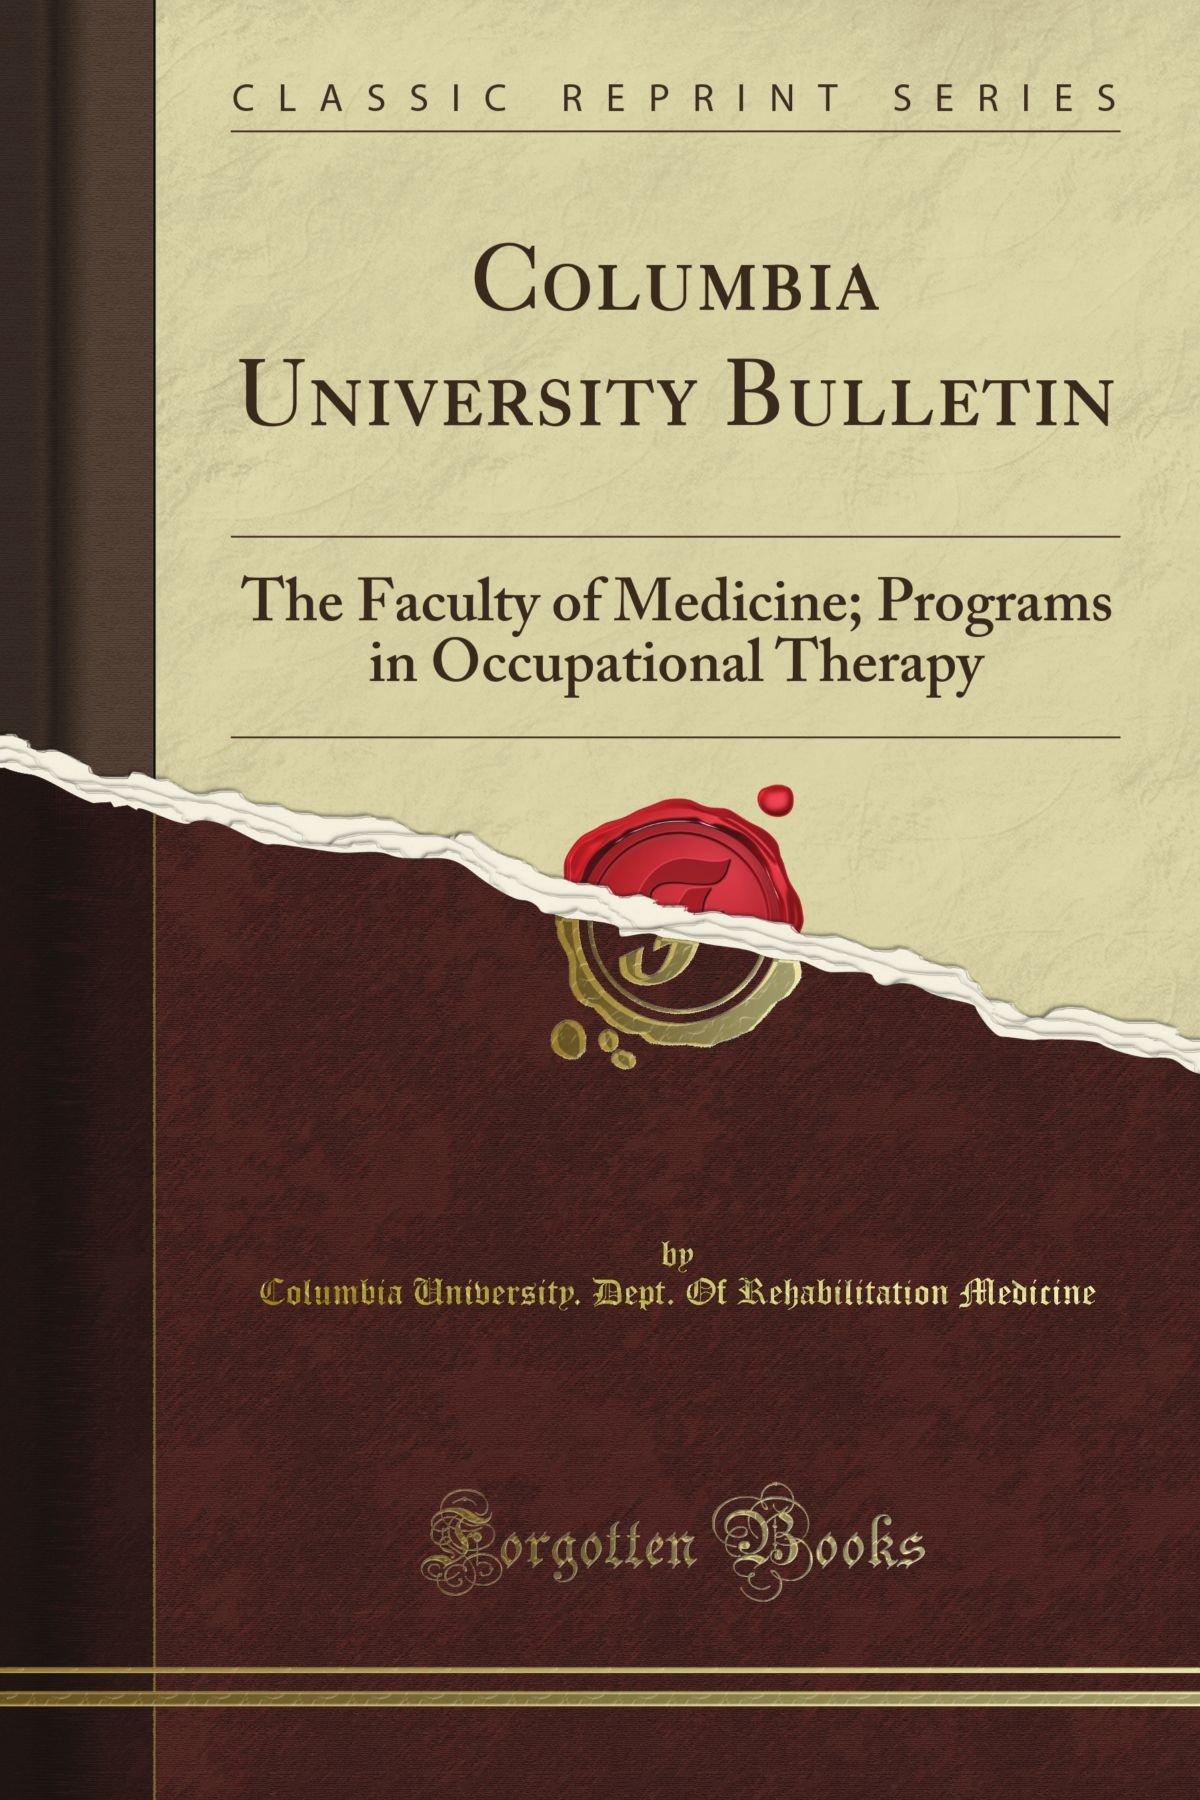 Columbia University Bulletin The Faculty Of Medicine Programs In